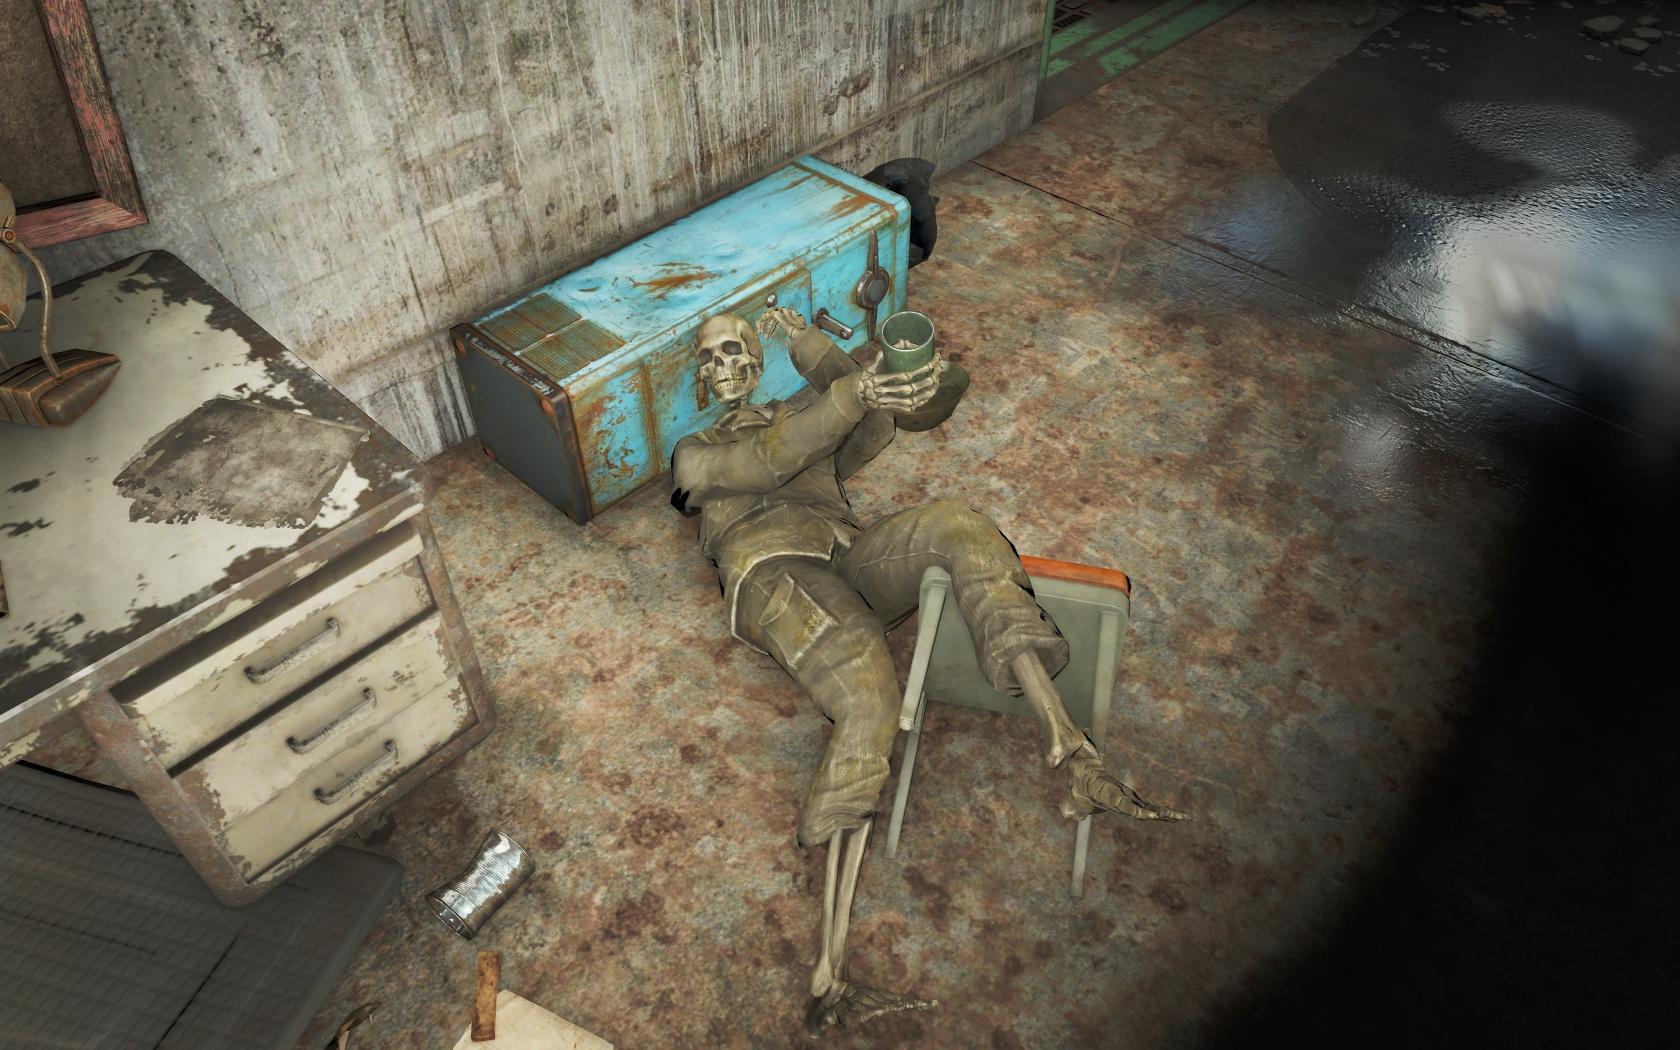 Предлагает выпить? (Спутниковая антенна базы Форт-Хаген) v2 - Fallout 4 антенна, скелет, Спутниковая антенна базы Форт-Хаген, Форт-Хаген